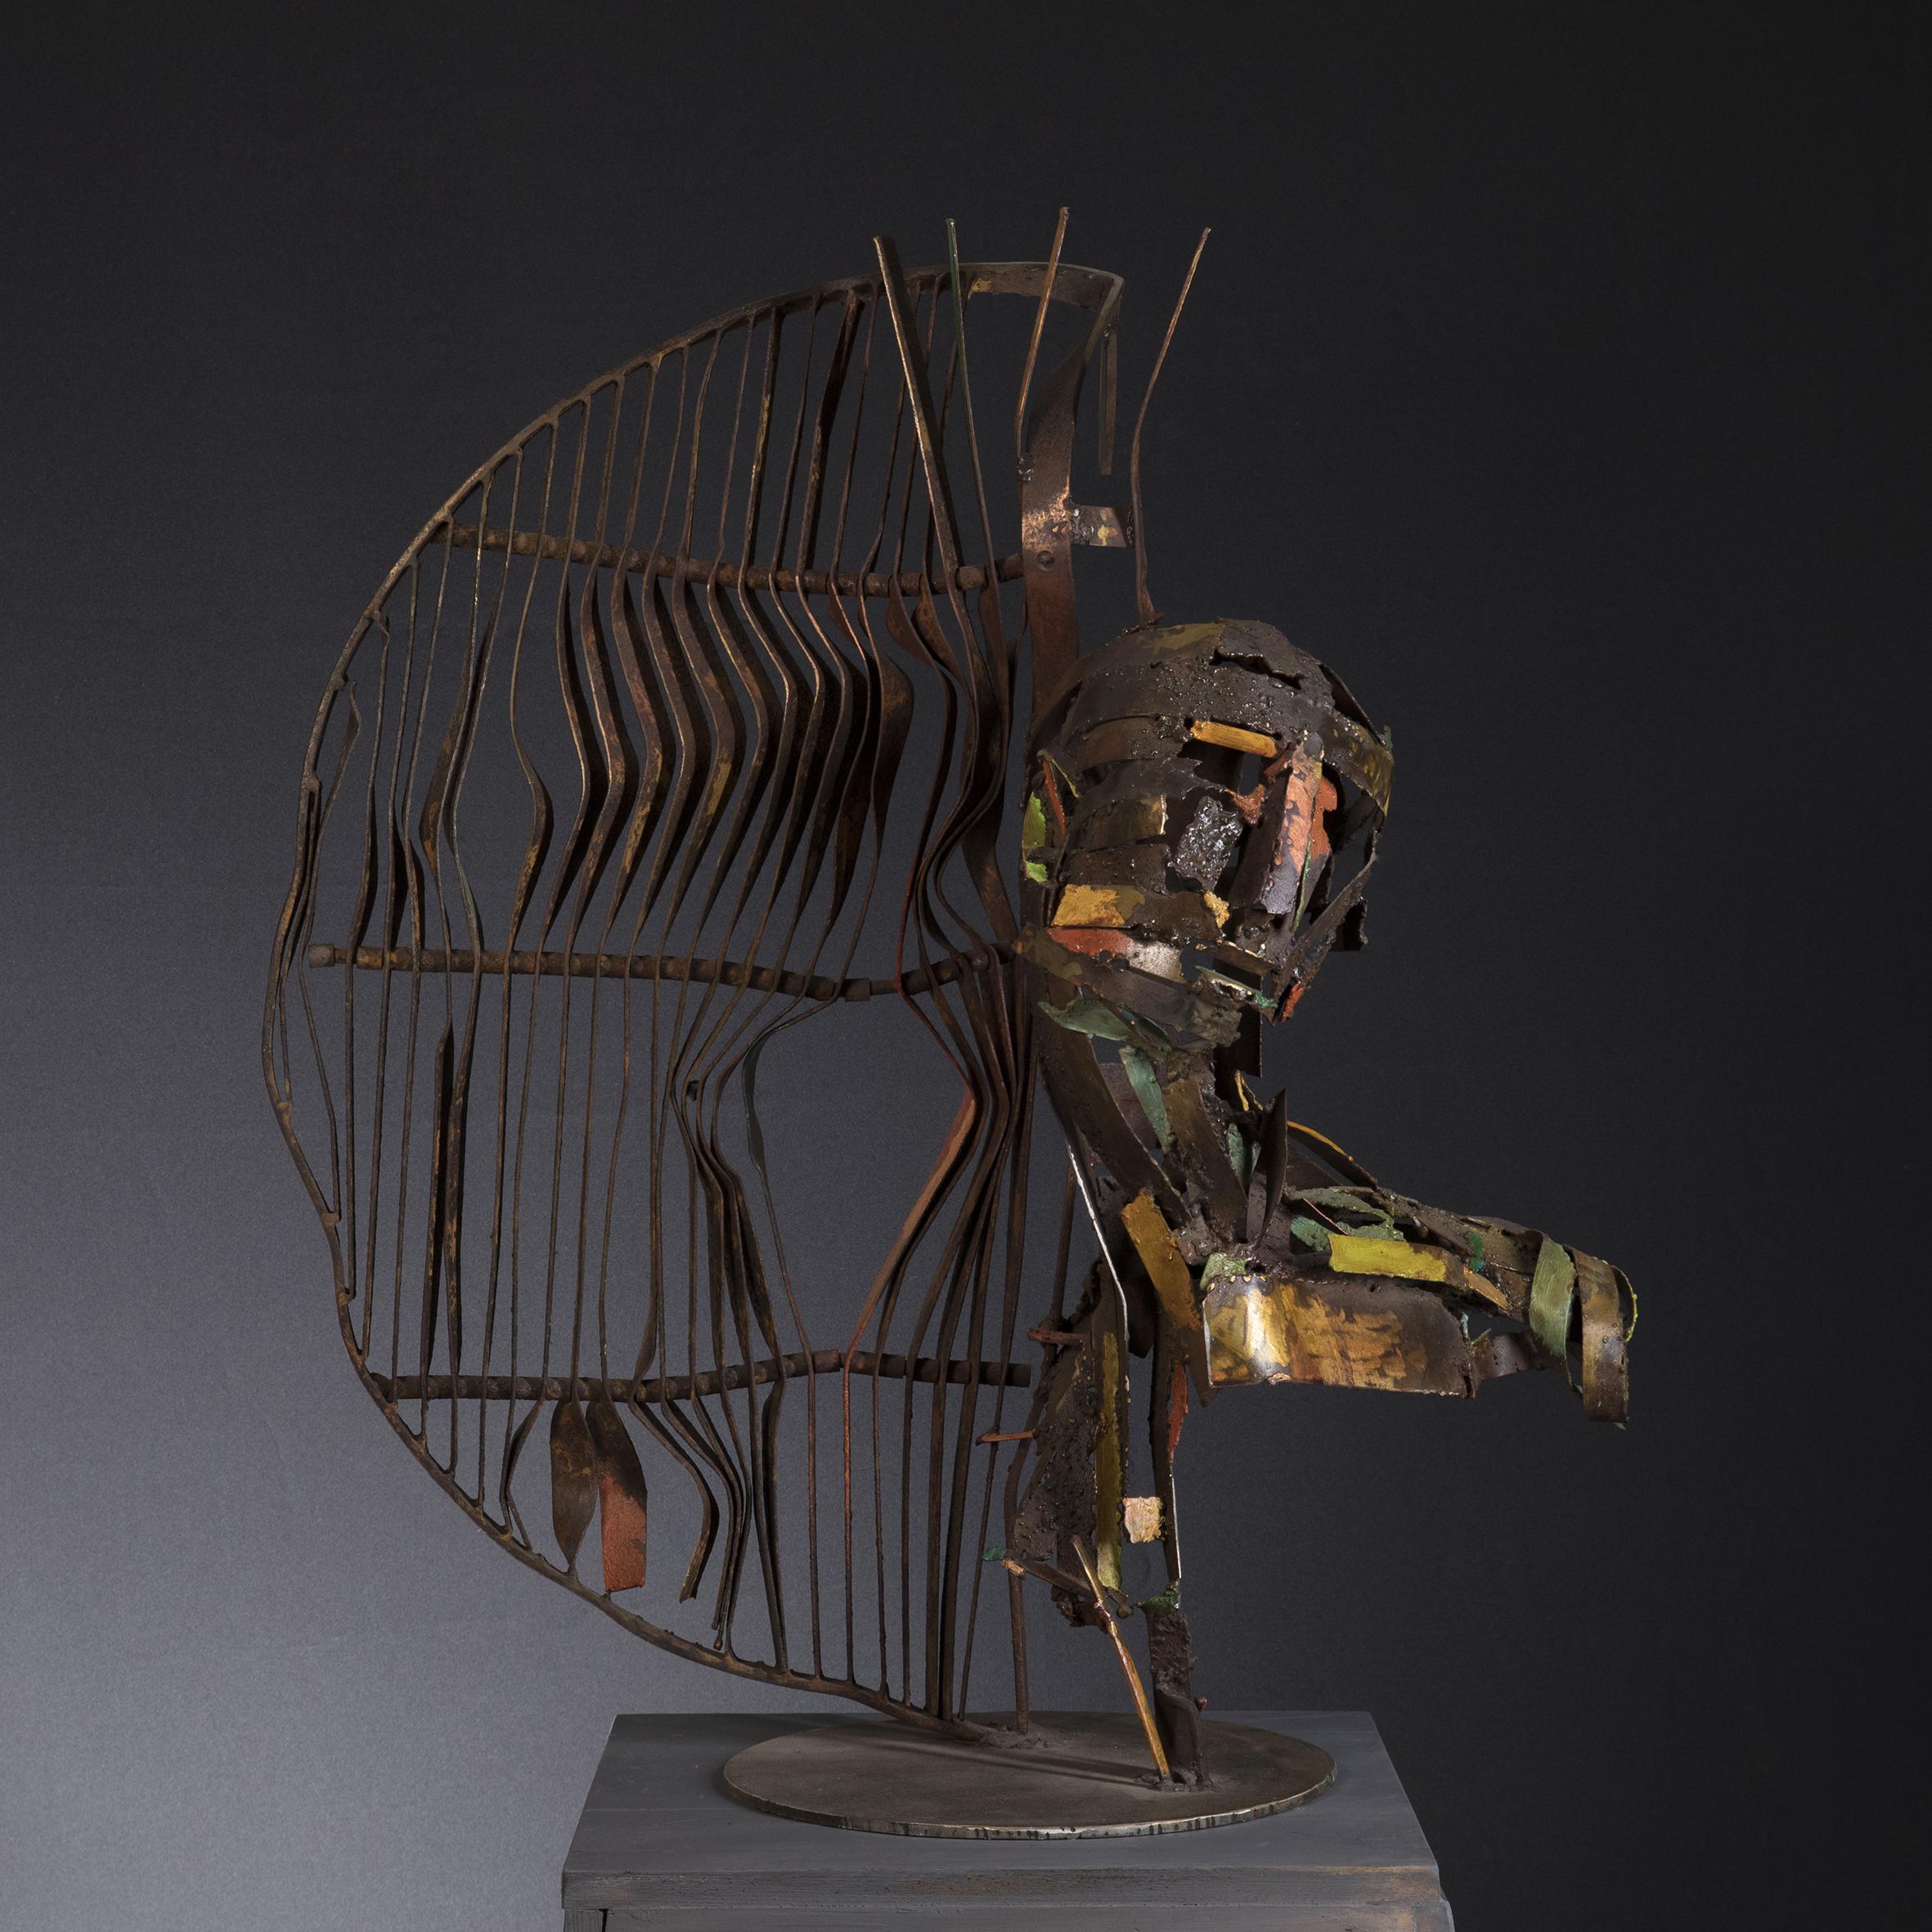 Africa - works 1990-2003